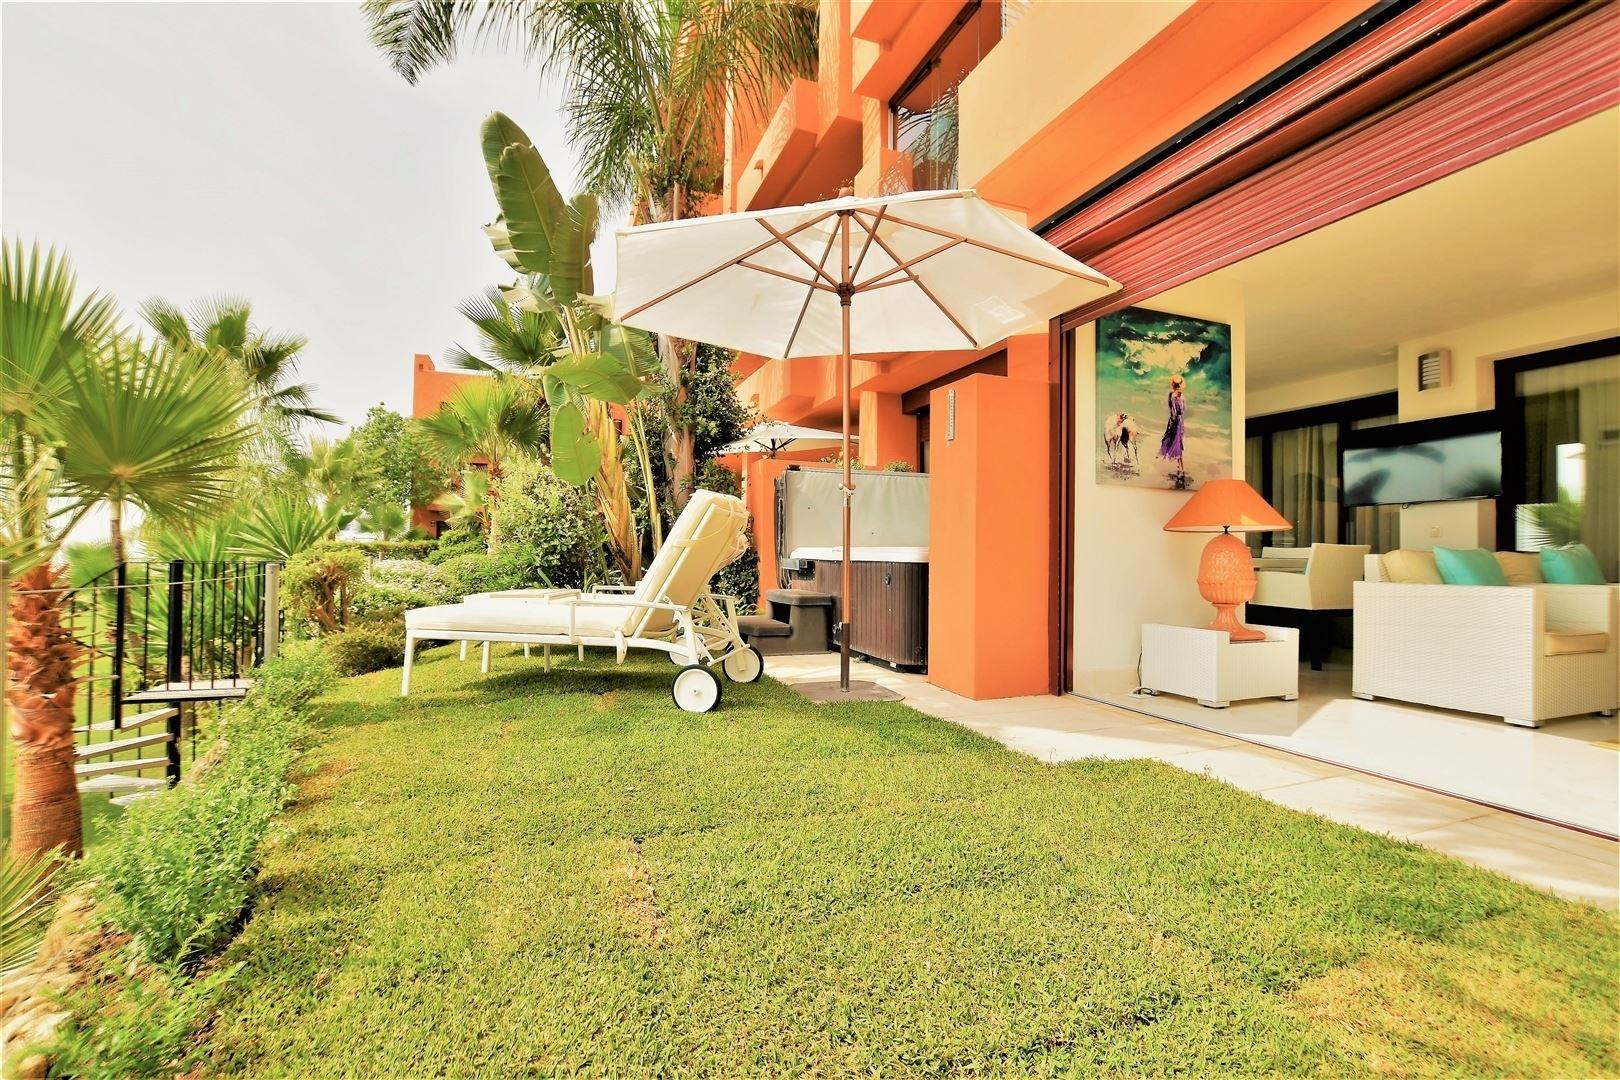 Foto 12 : Appartement te 29679 MARBELLA (Spanje) - Prijs € 1.750